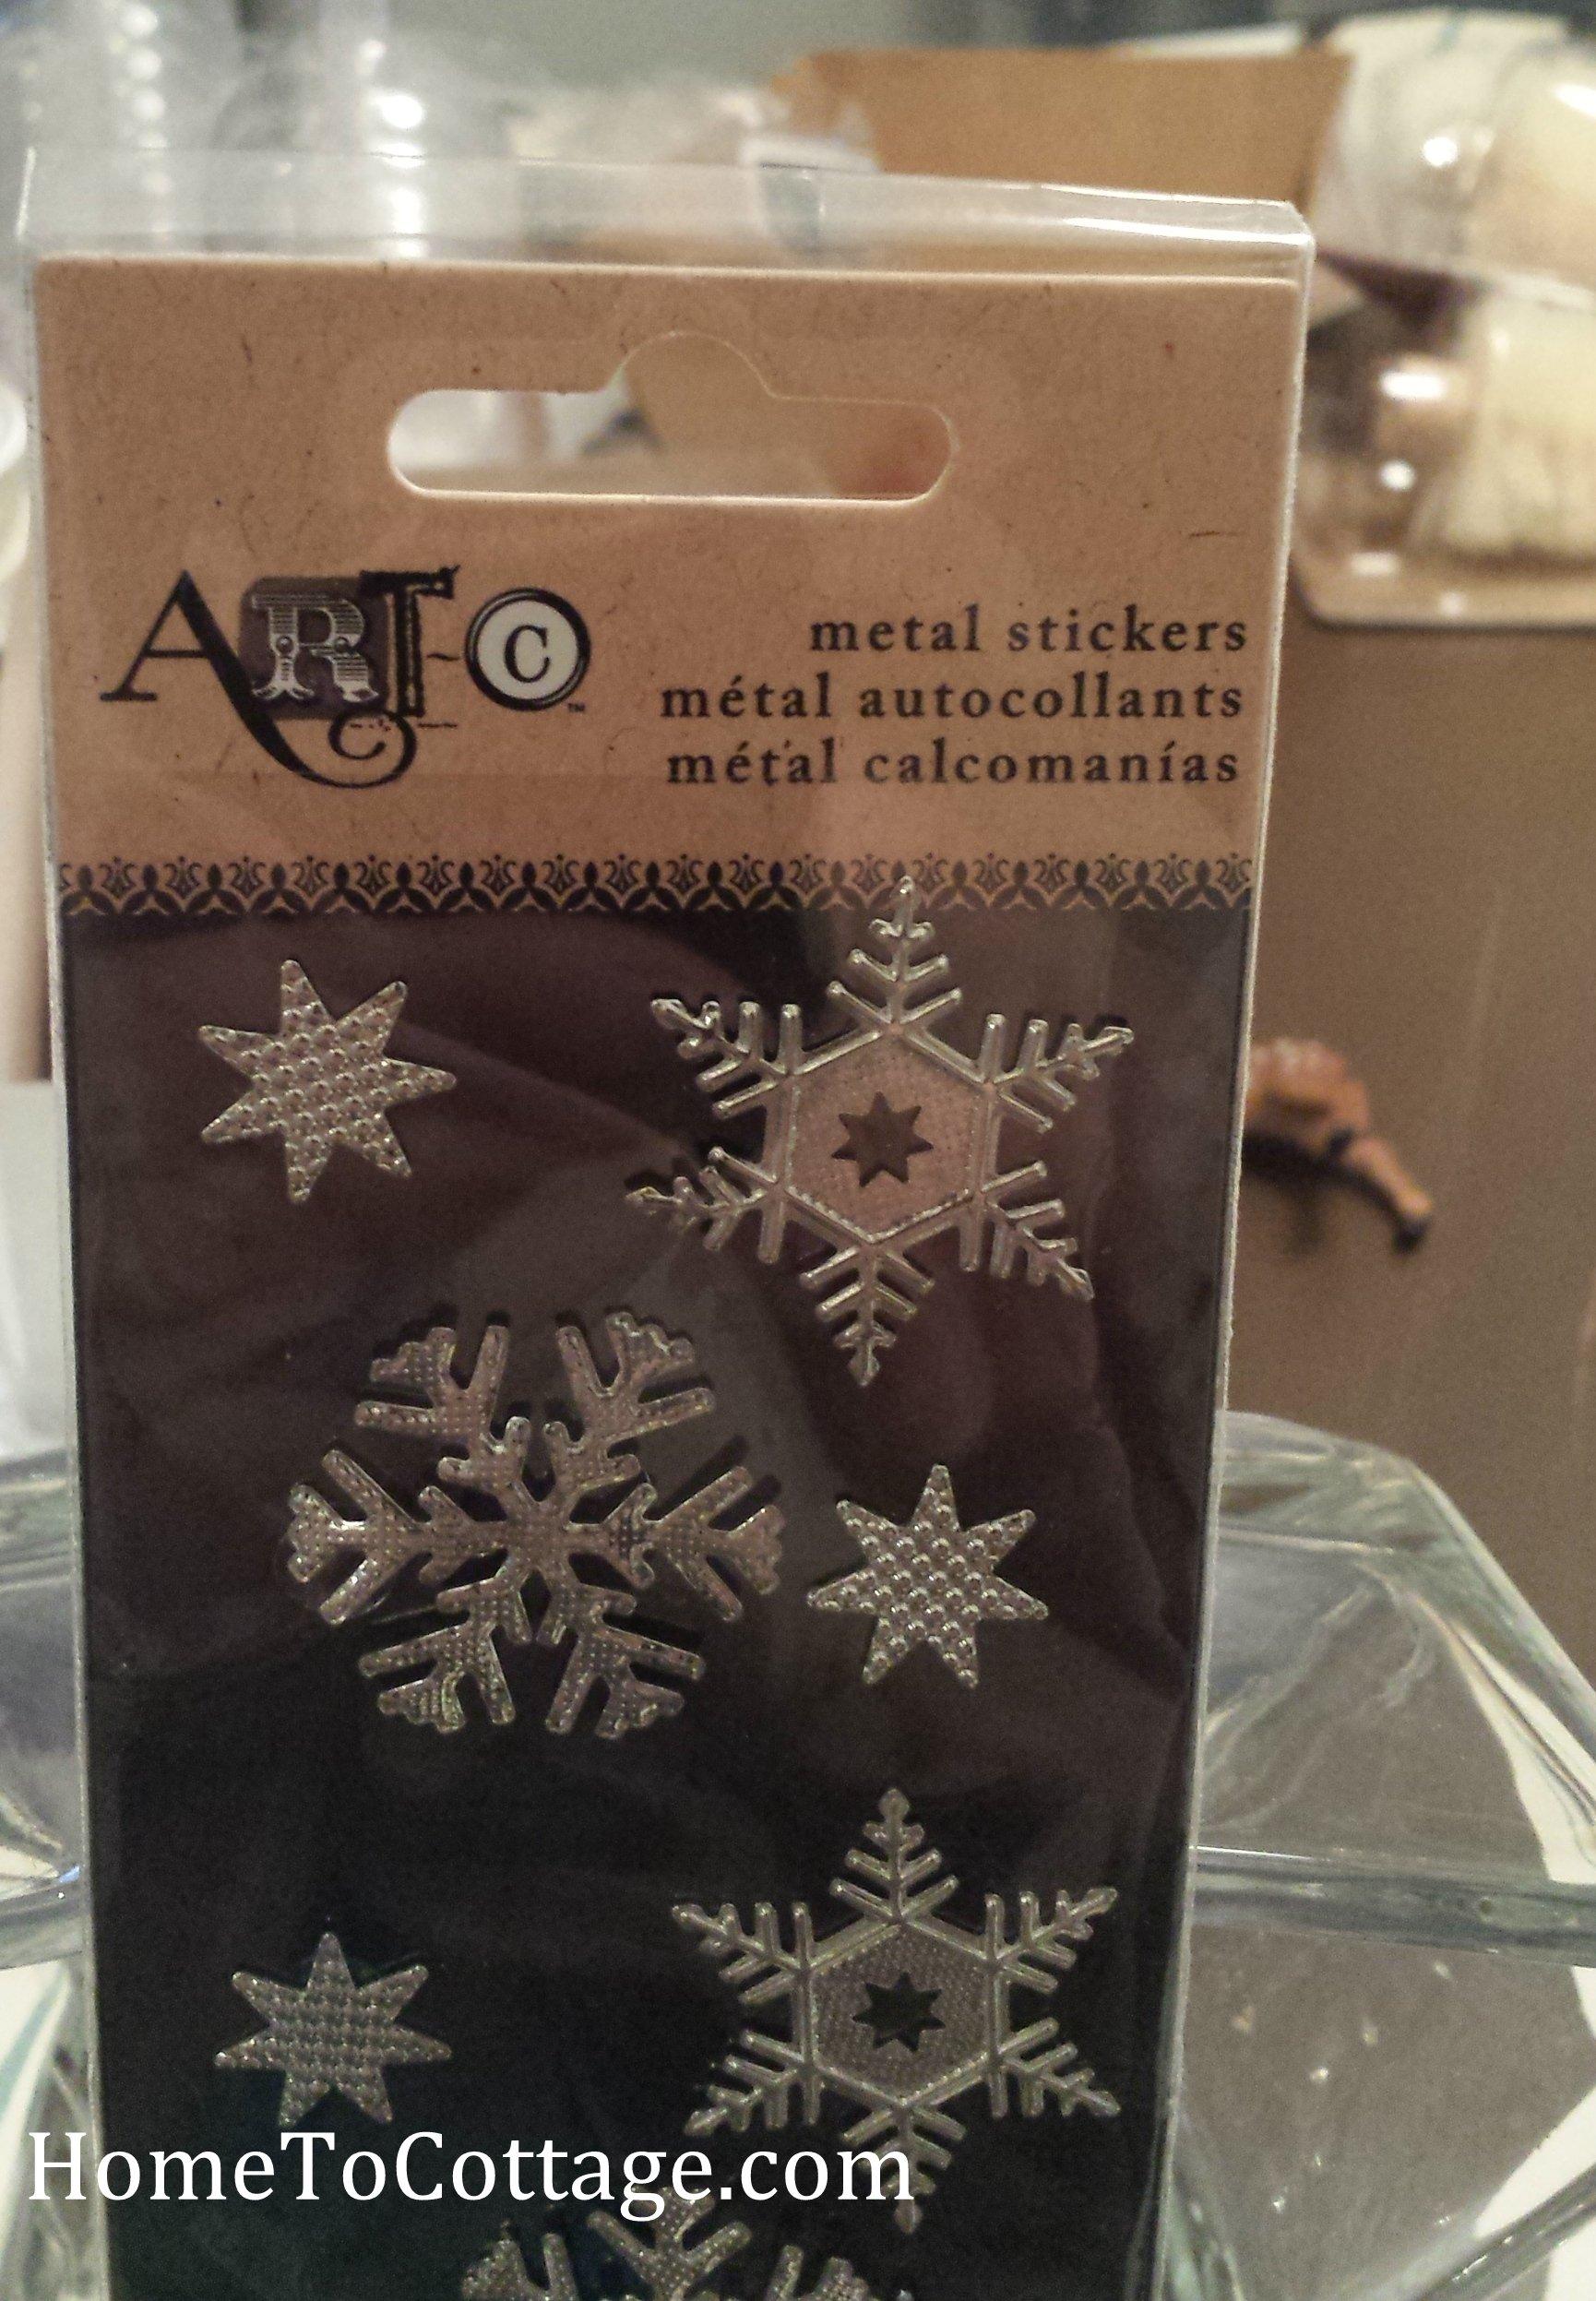 5 HomeToCottage.com diorama snowflakes